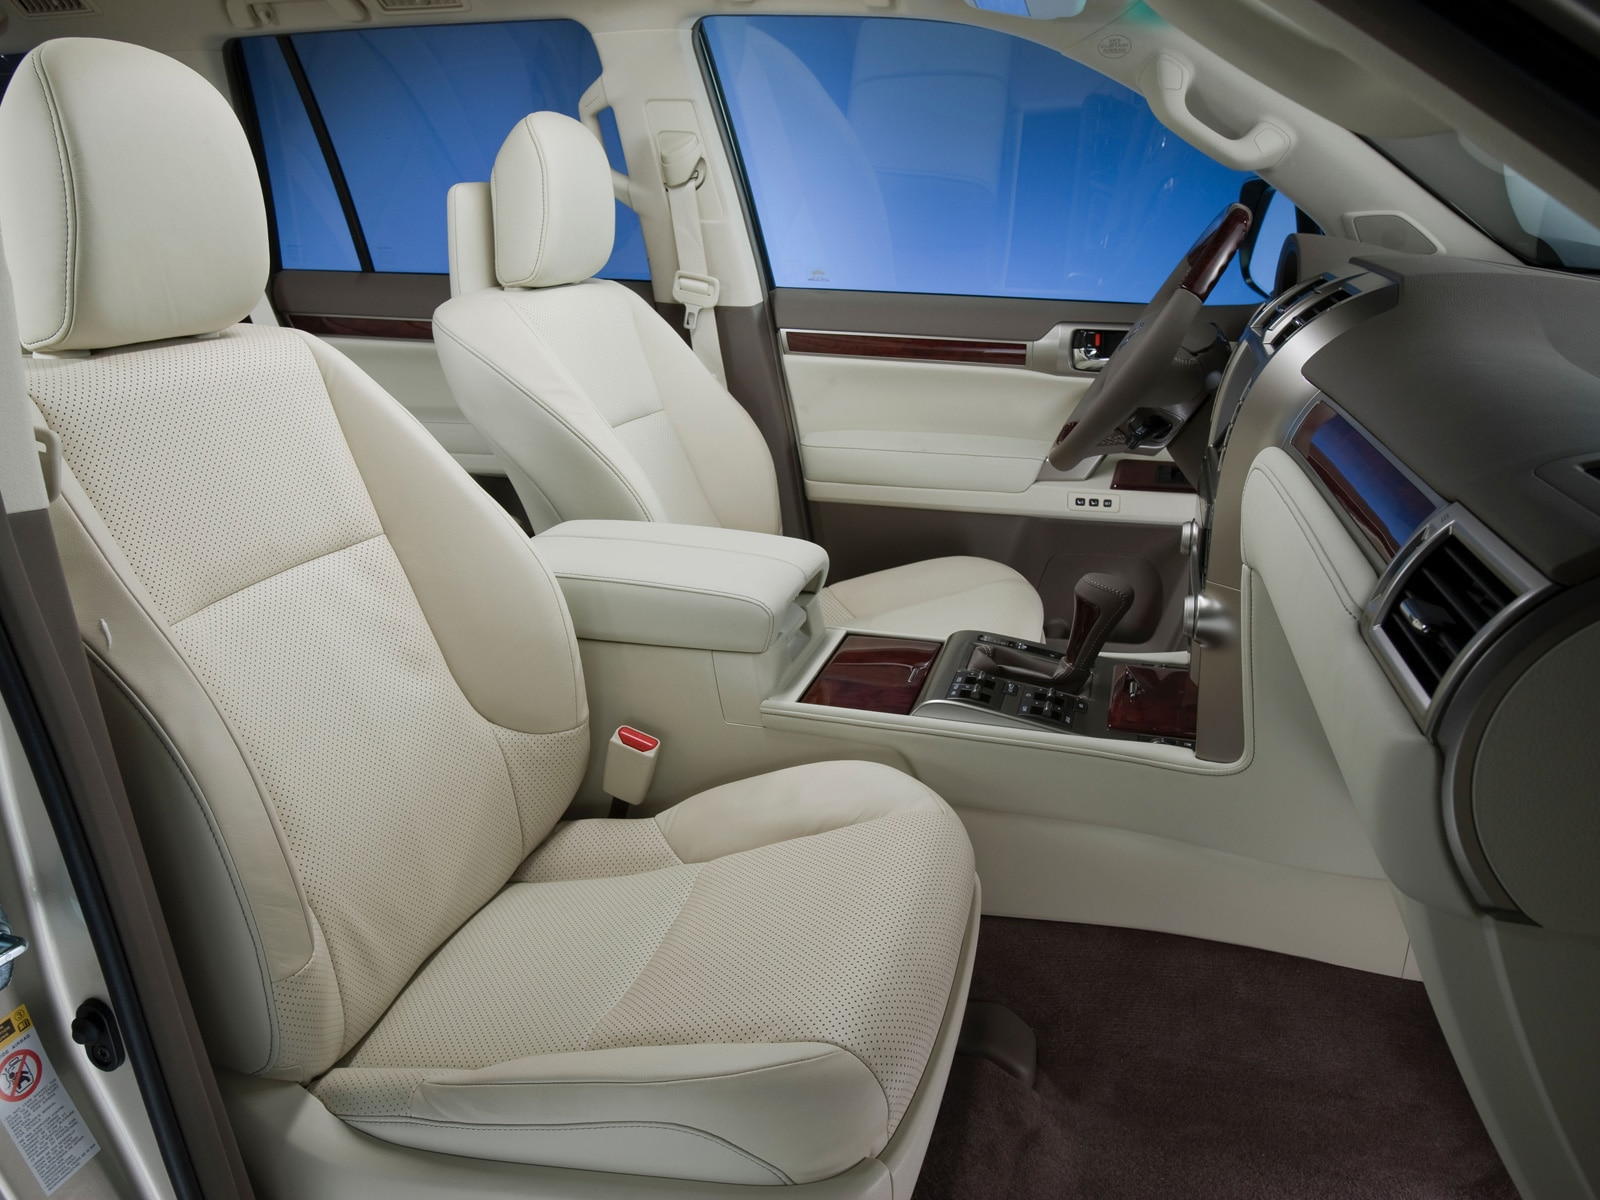 2010 Lexus Gx 460 Lexus Midsize Luxury Suv Review Automobile Magazine